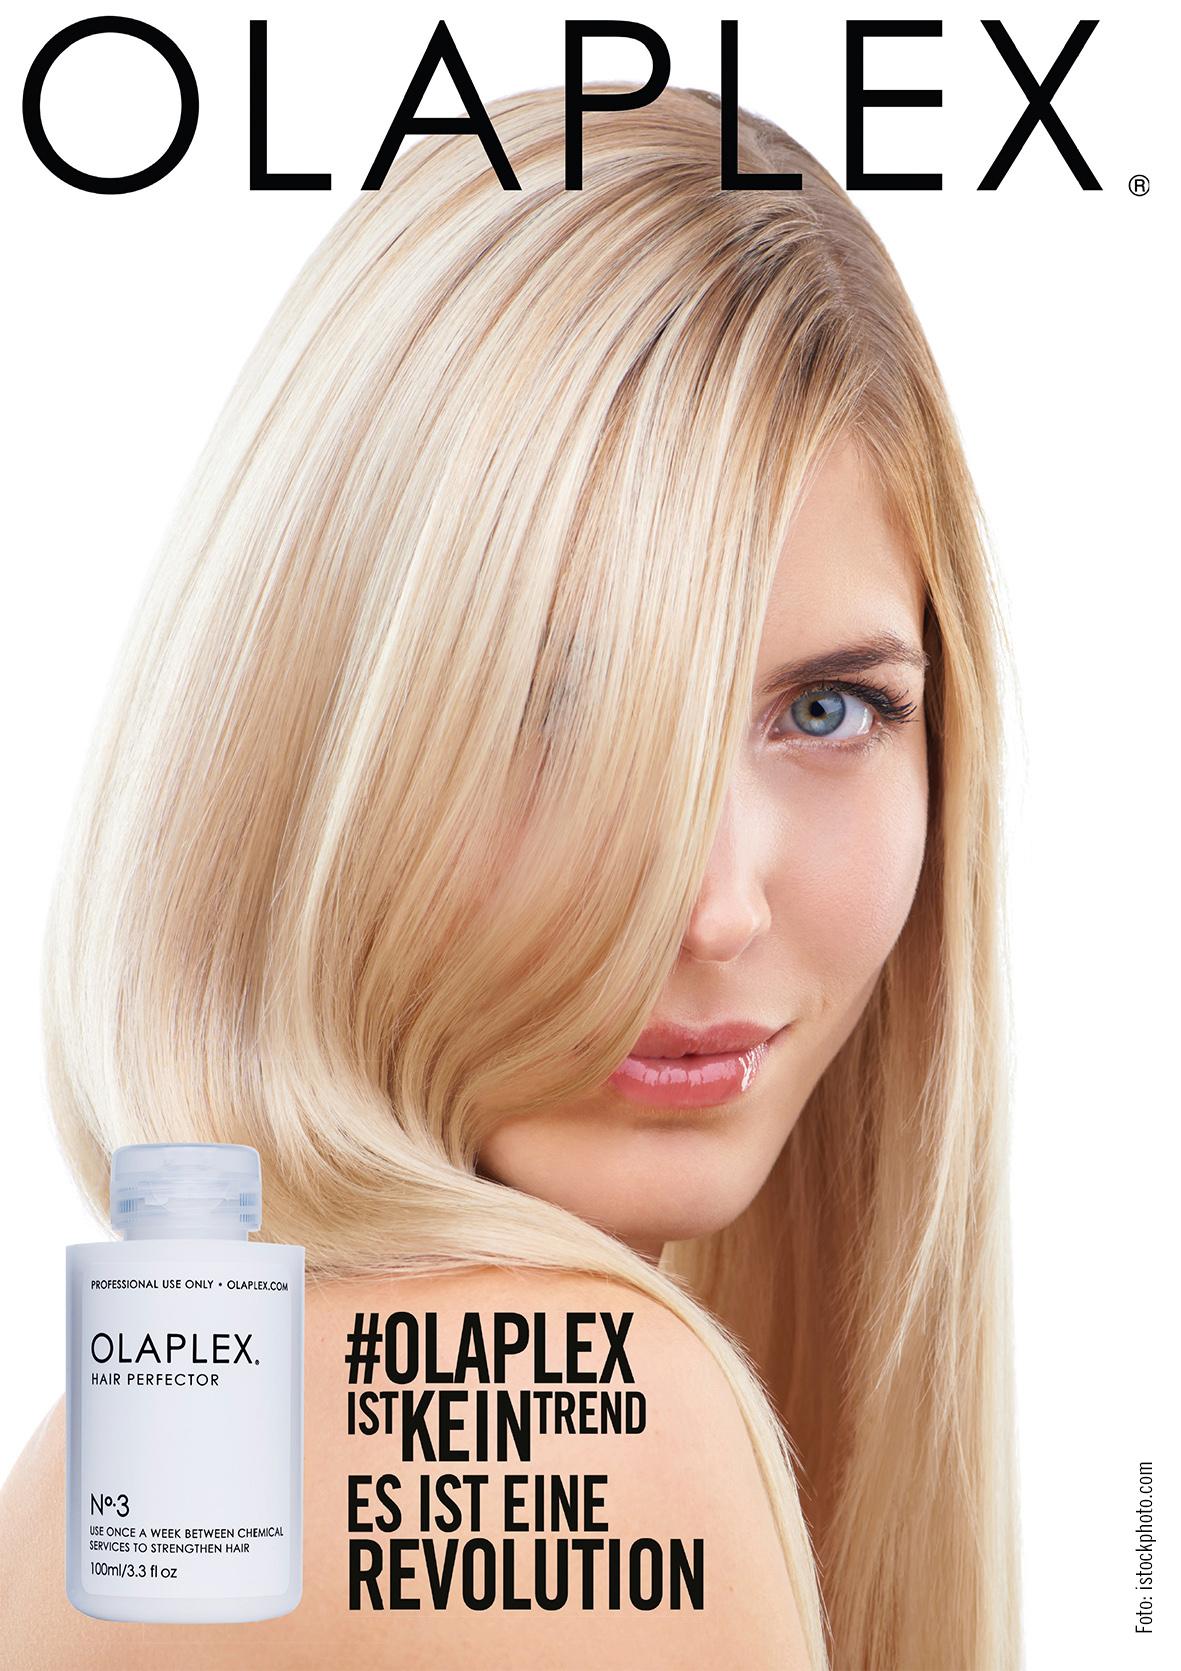 Olaplex revolutioniert die fris rbranche klipp fris r for Olaplex salon